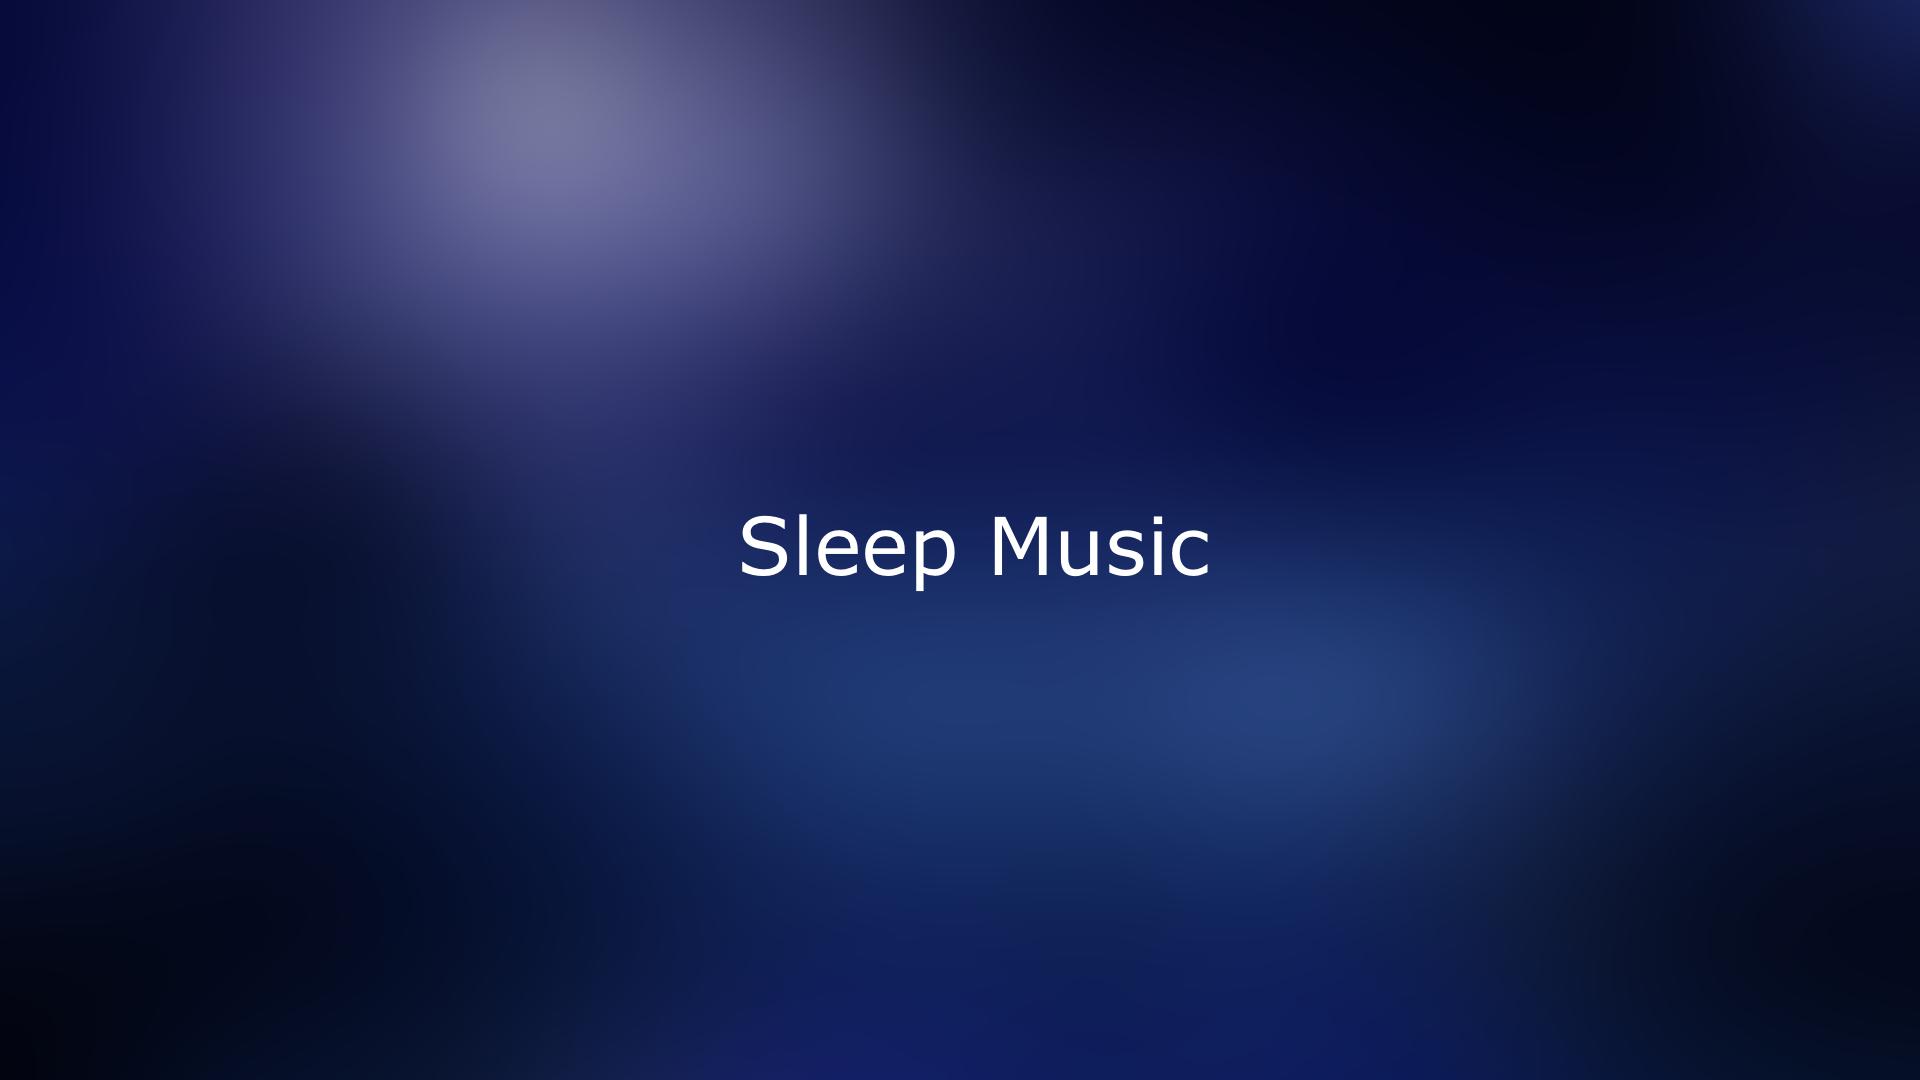 deep purple color behind sleep music text